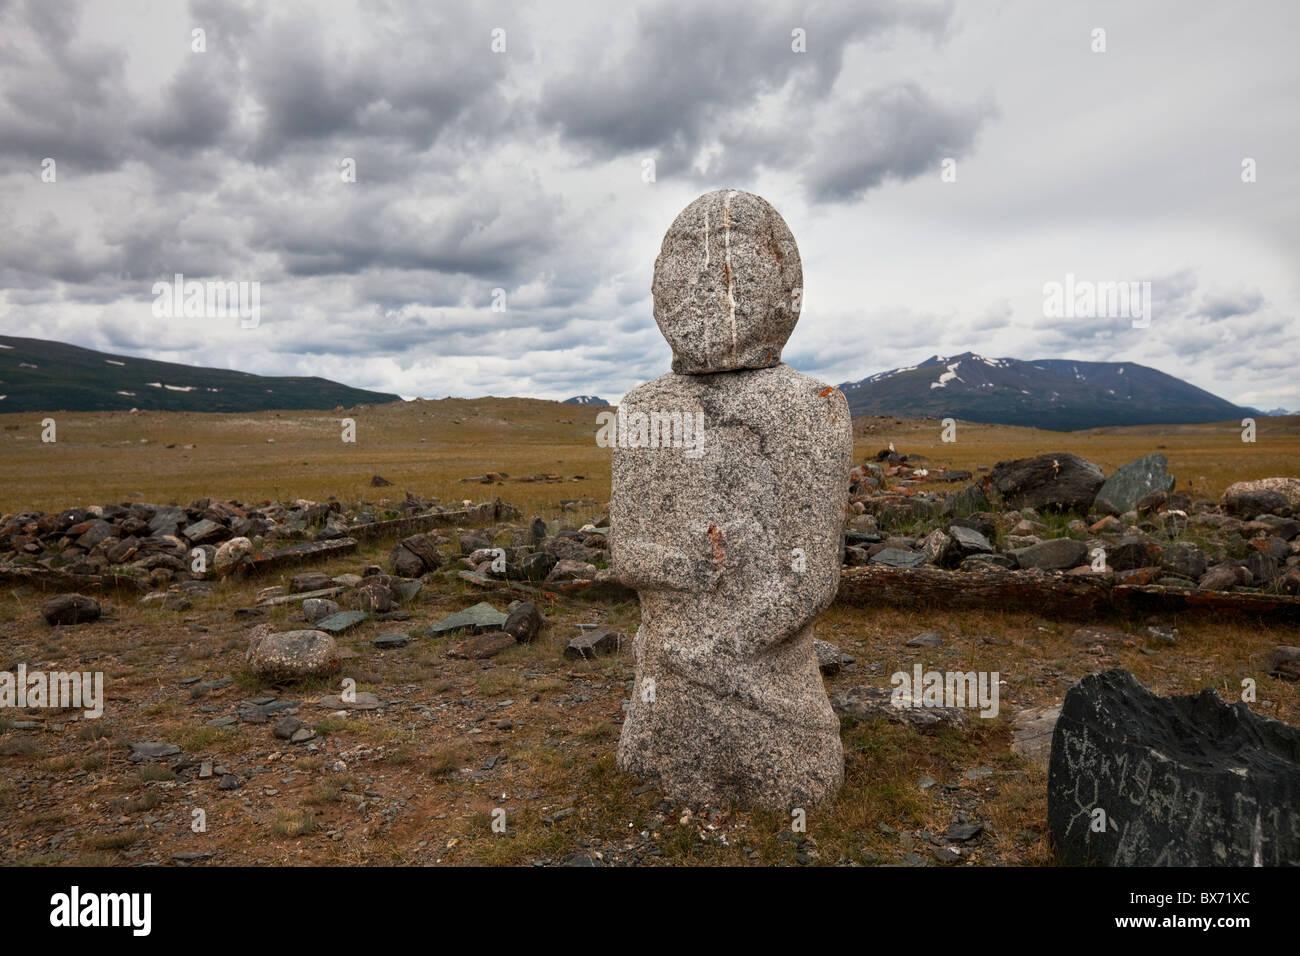 Las estelas de piedra antigua en Mongolia, cerca del lago Hoton, oeste de Mongolia Imagen De Stock